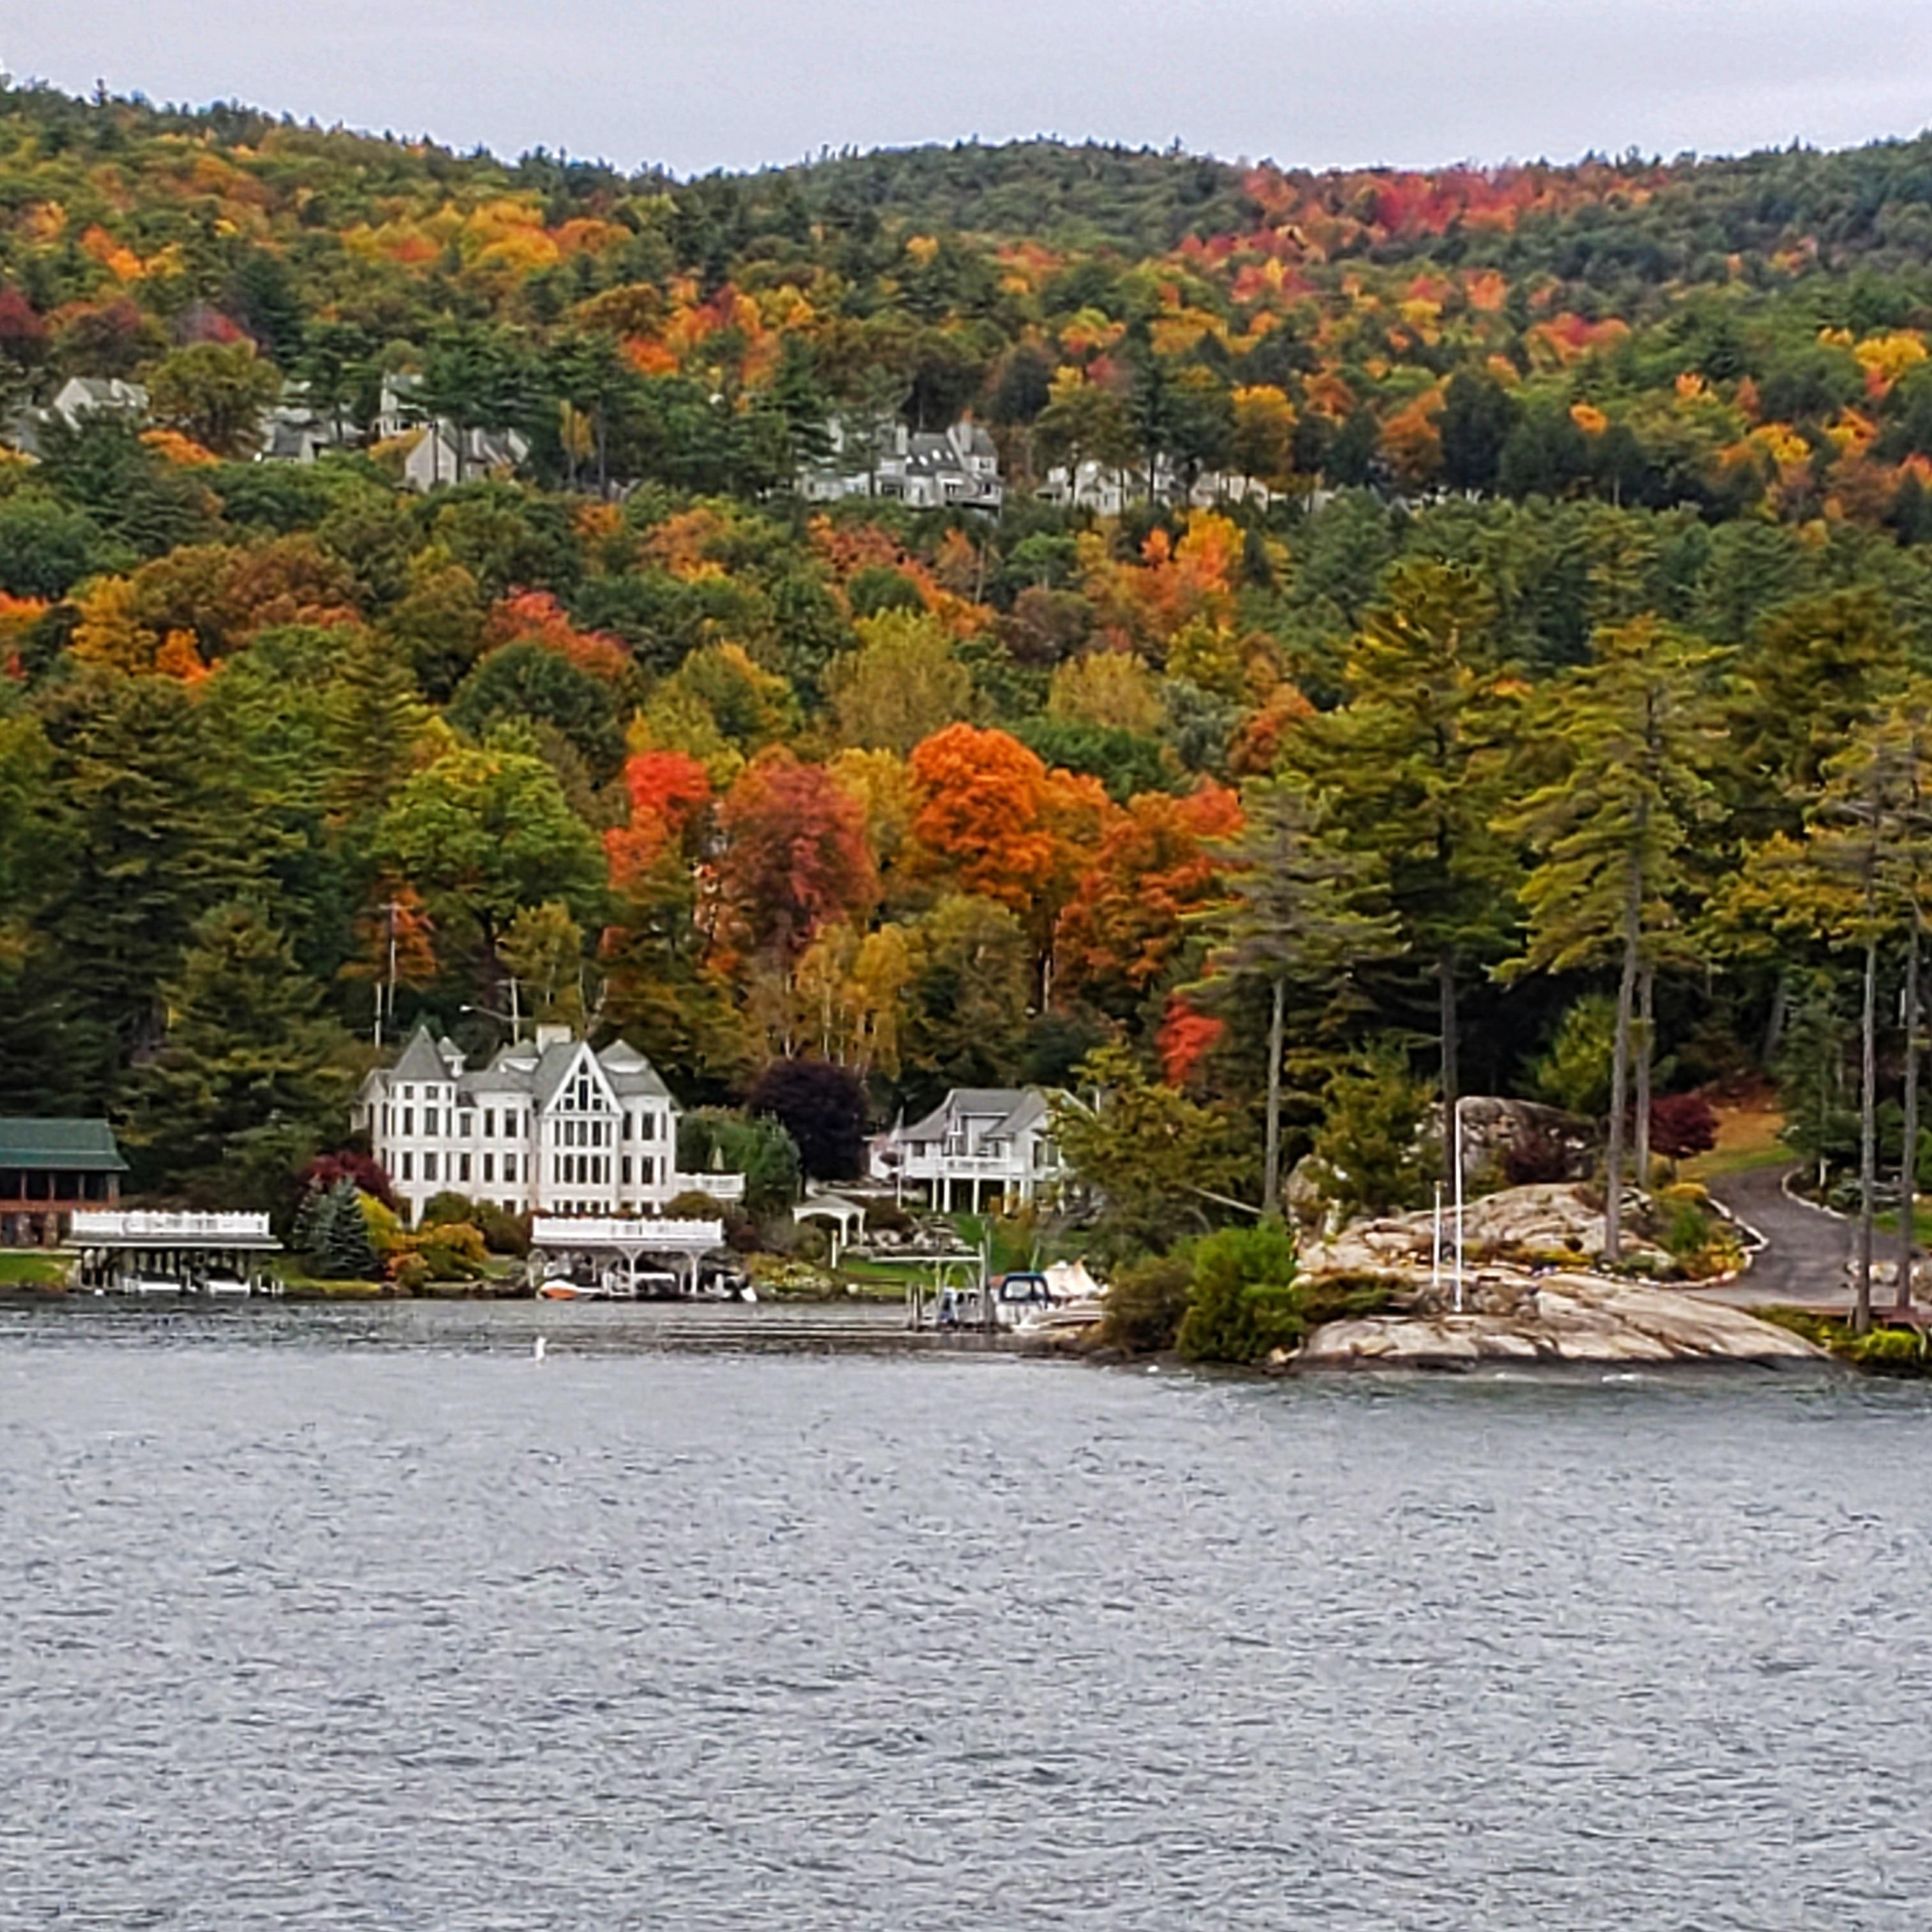 Lake George, Warren County, New York, United States of America